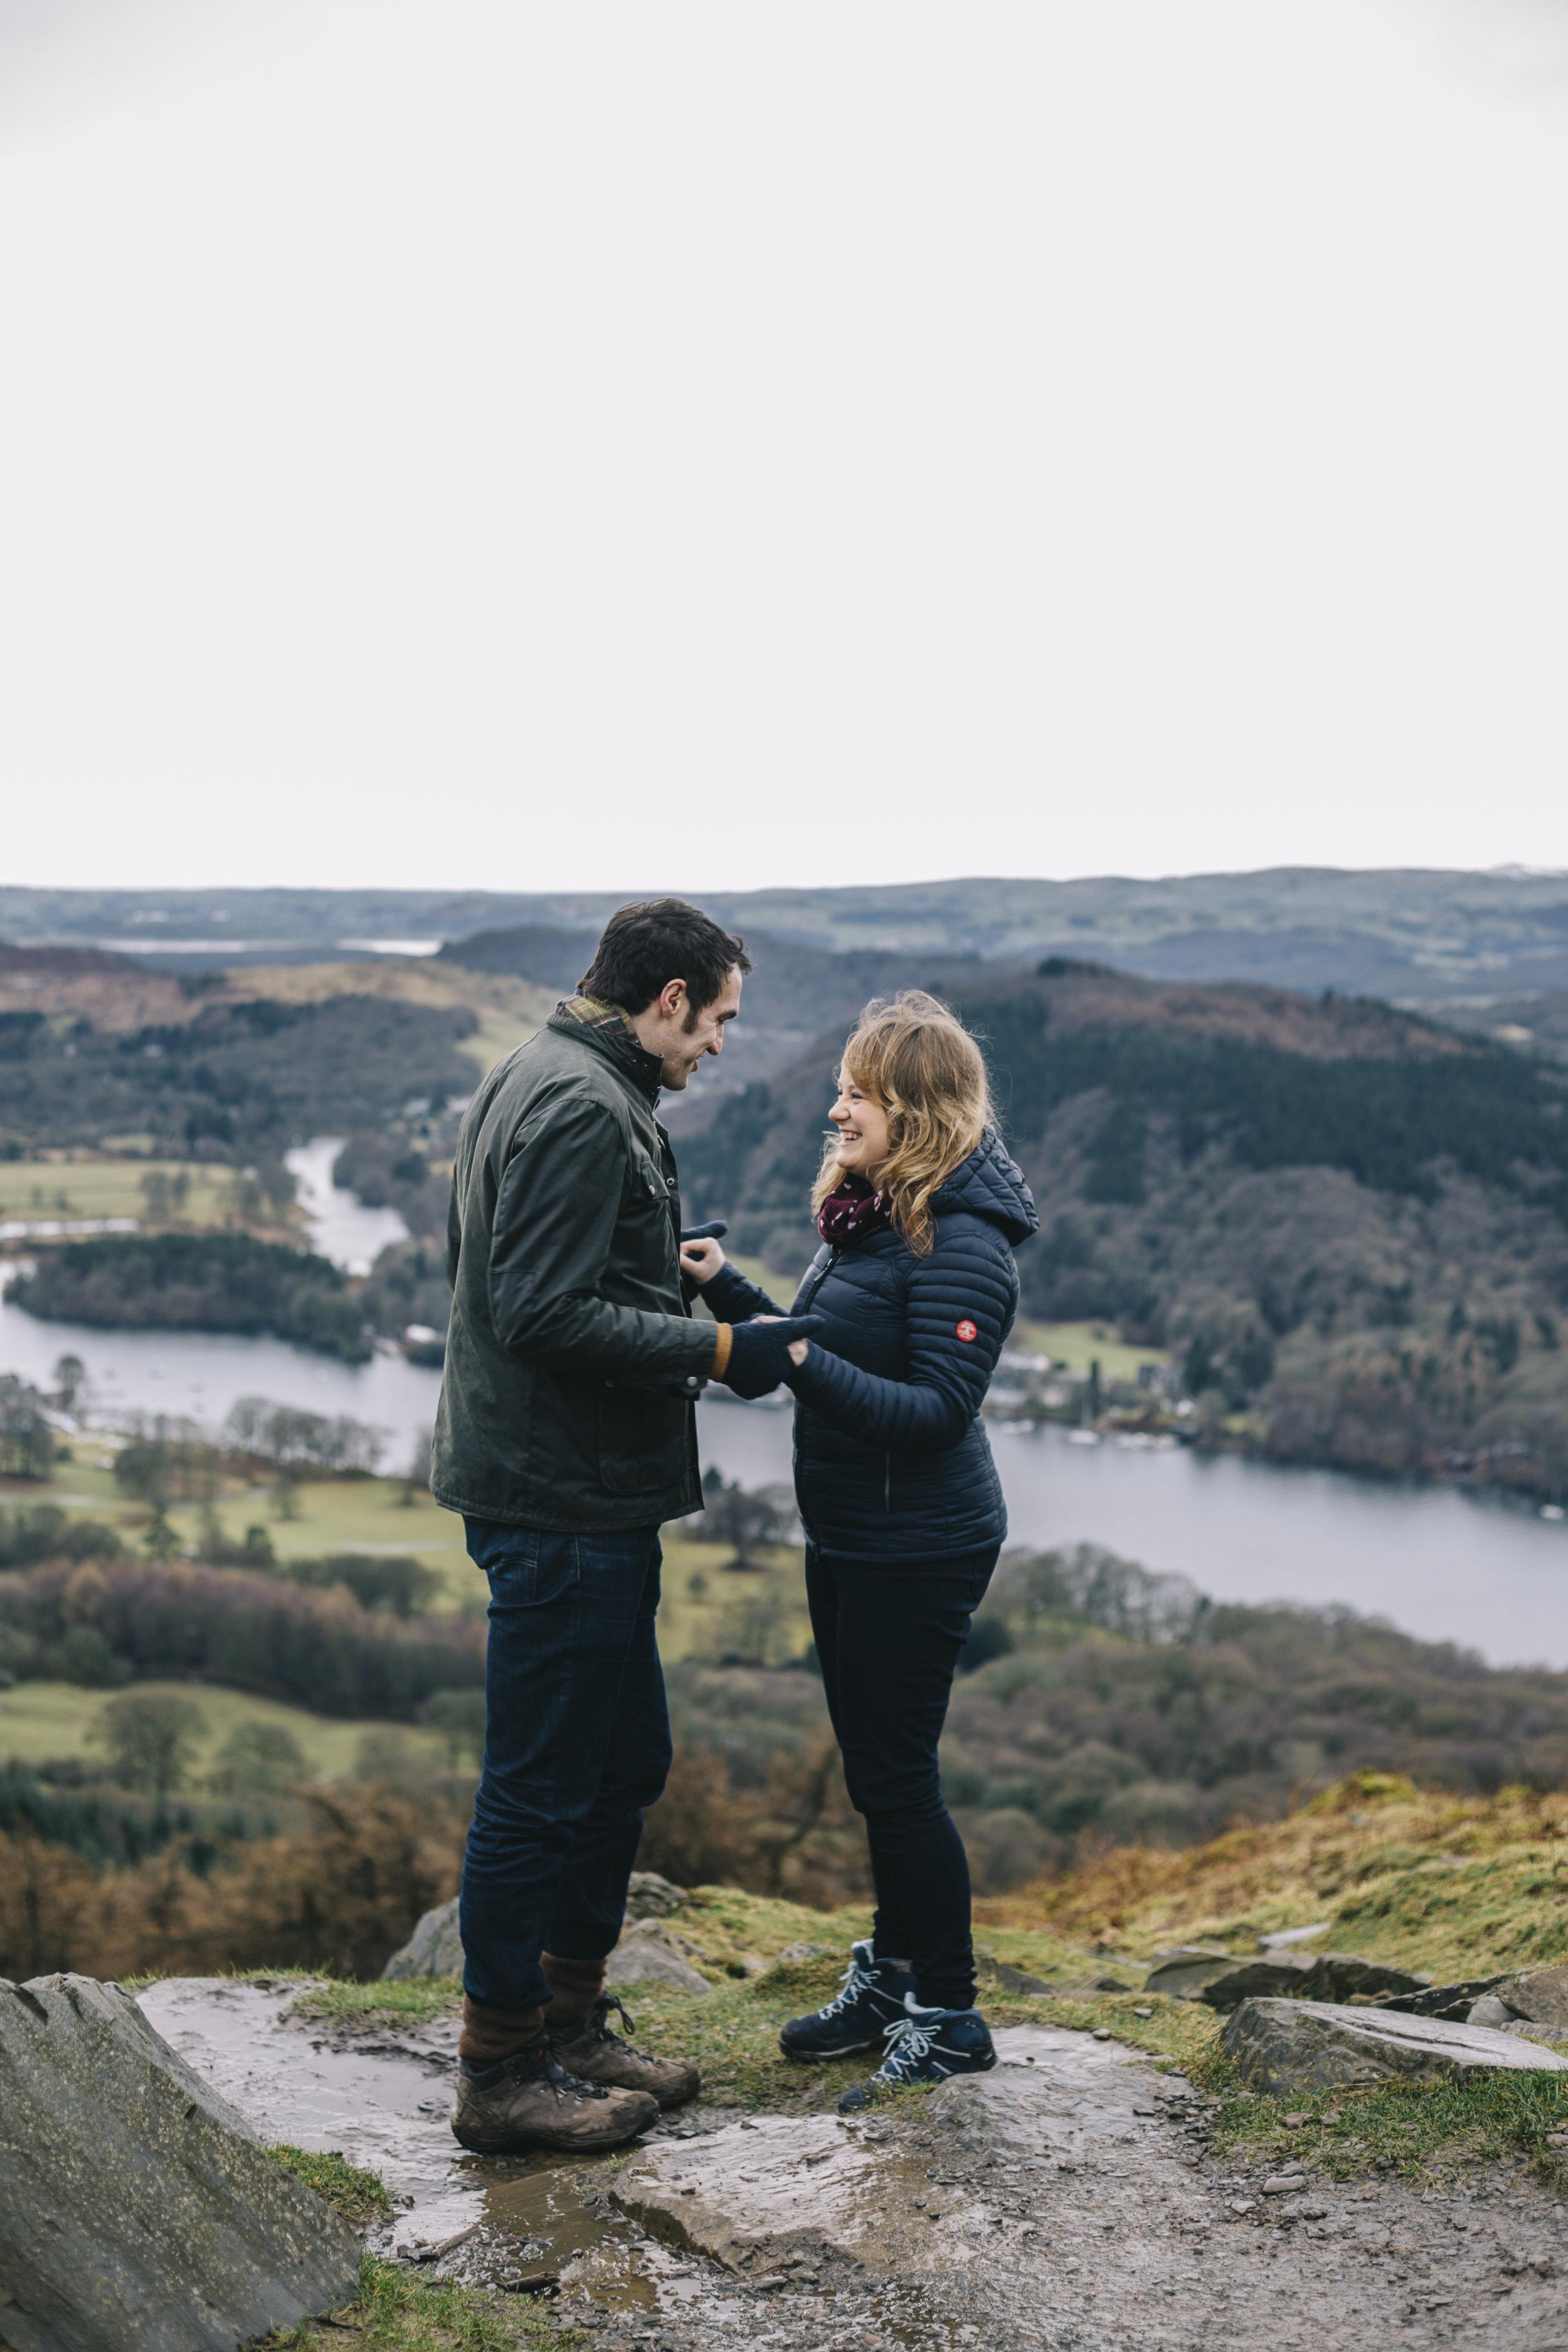 Alex + Matt - Windermere Engagement Photography - Claire Basiuk - 04.jpg